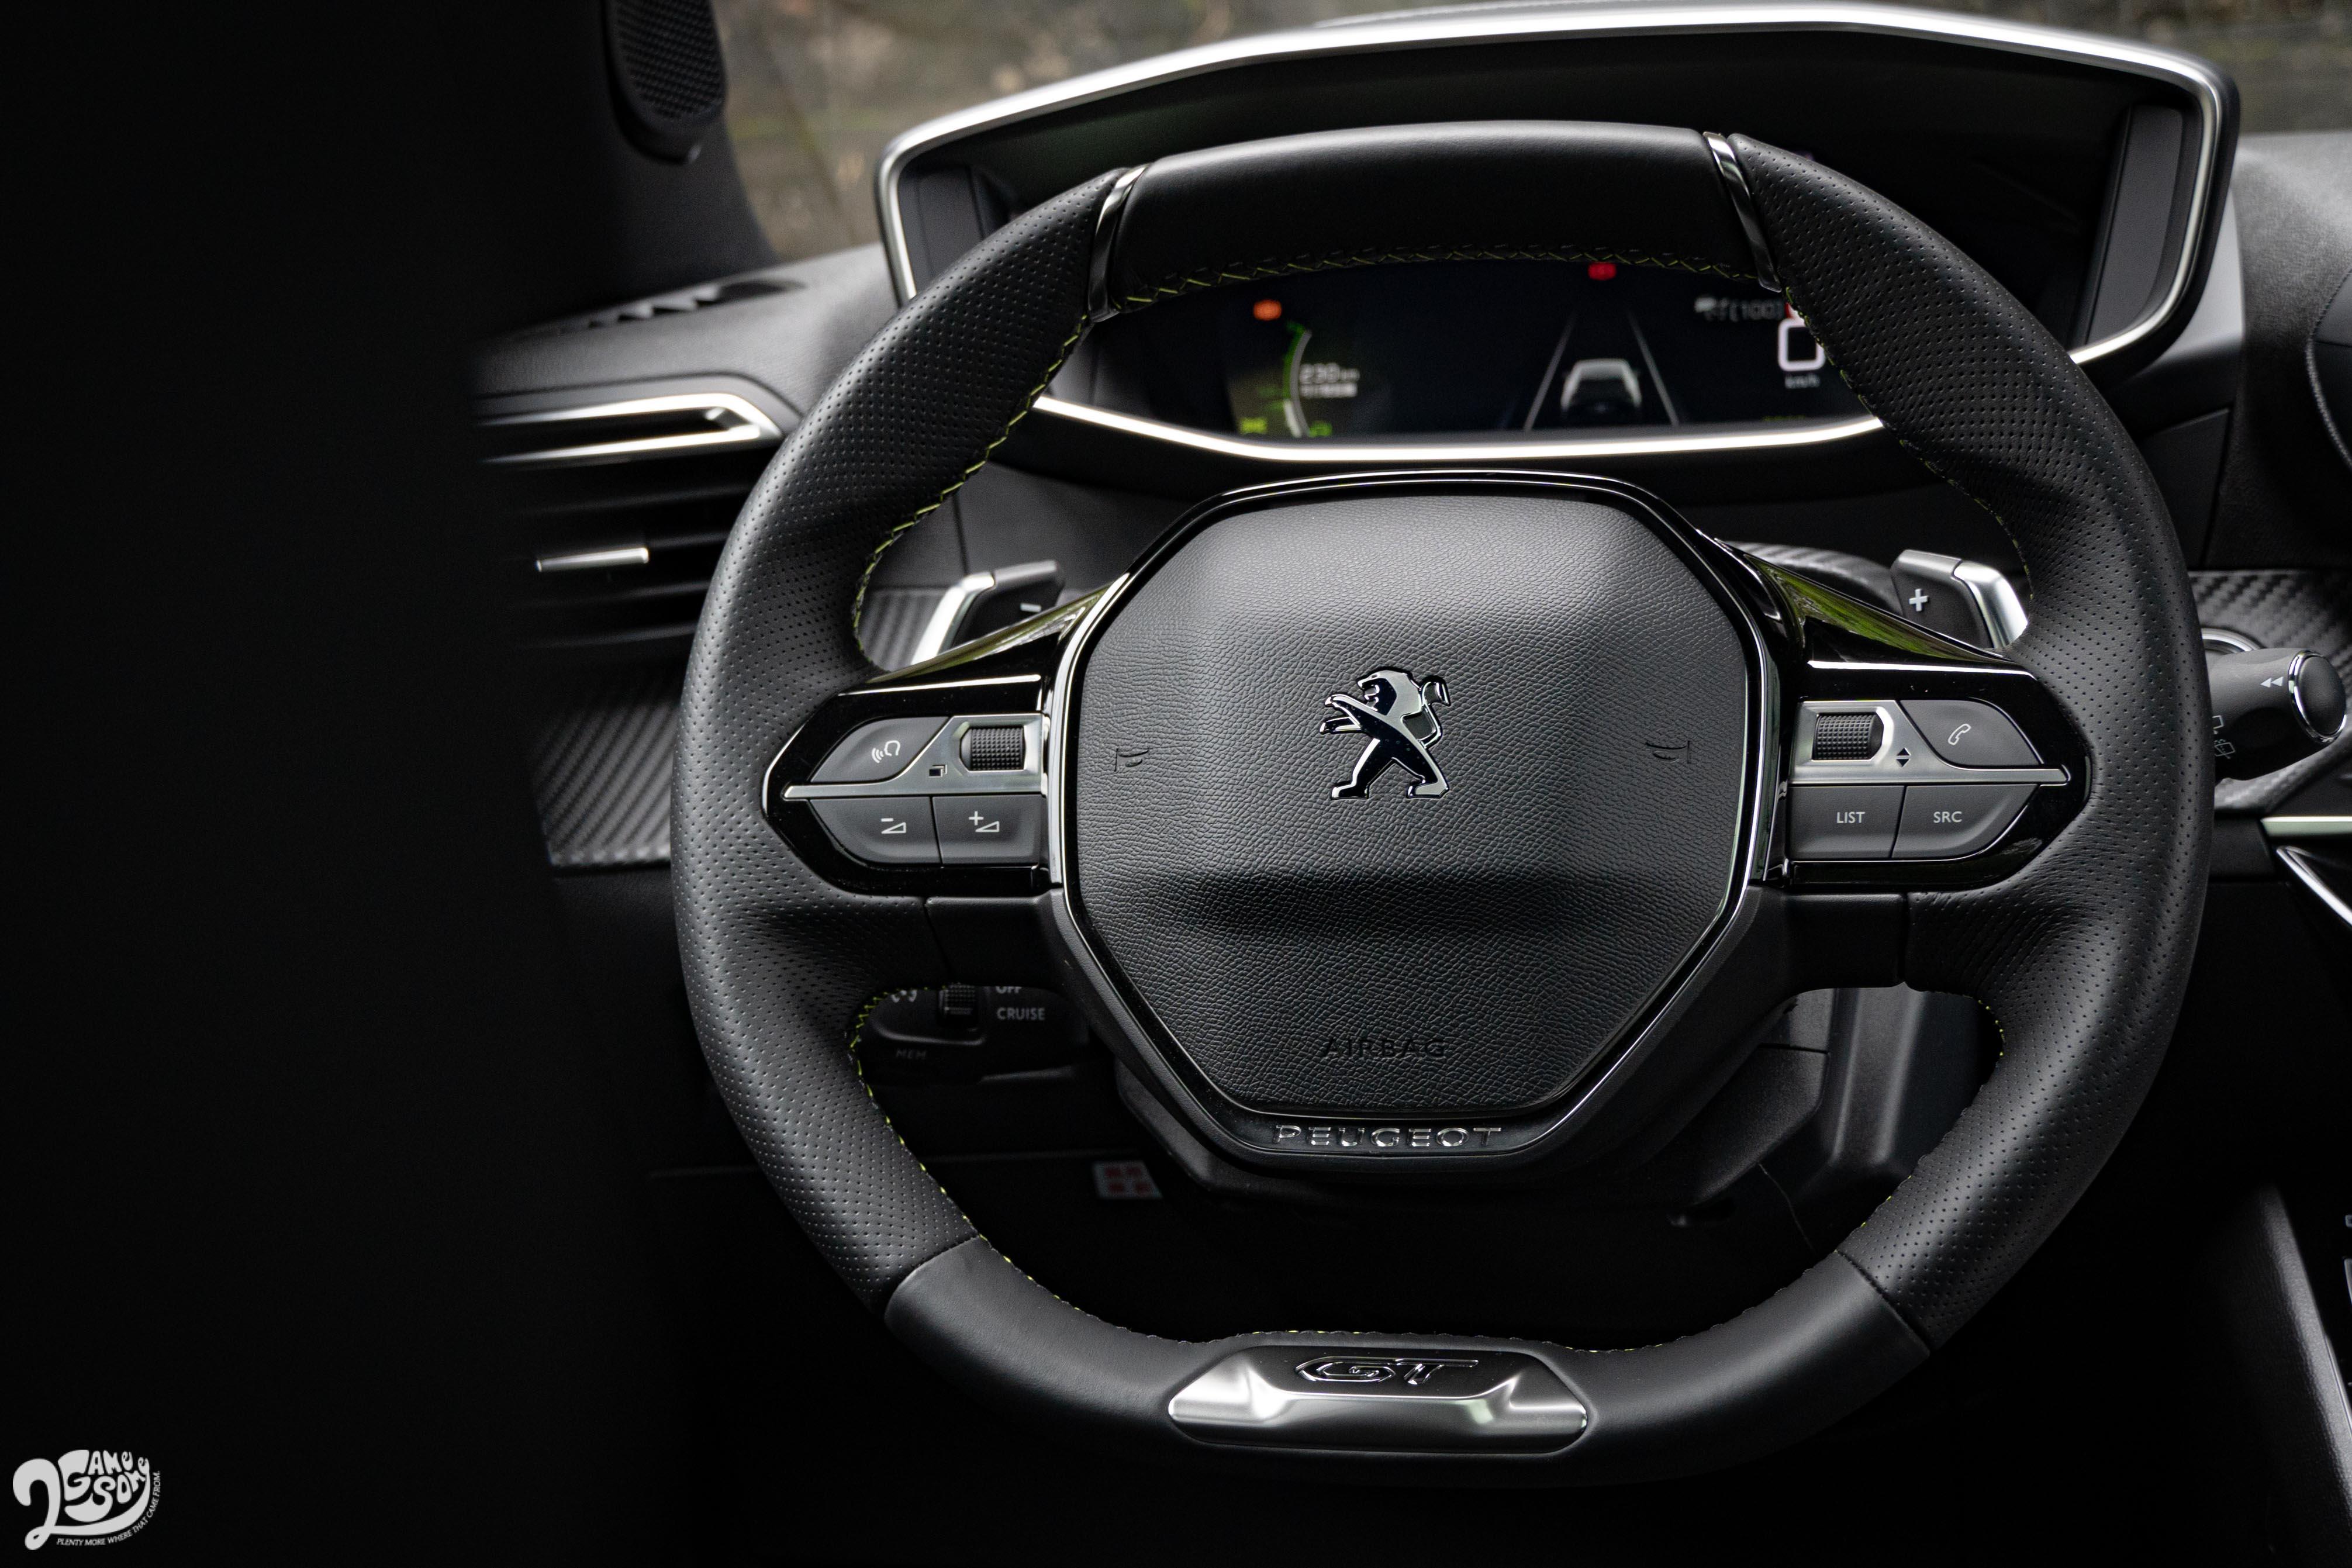 Peugeot 一貫的小盤徑方向盤標配換檔撥桿。